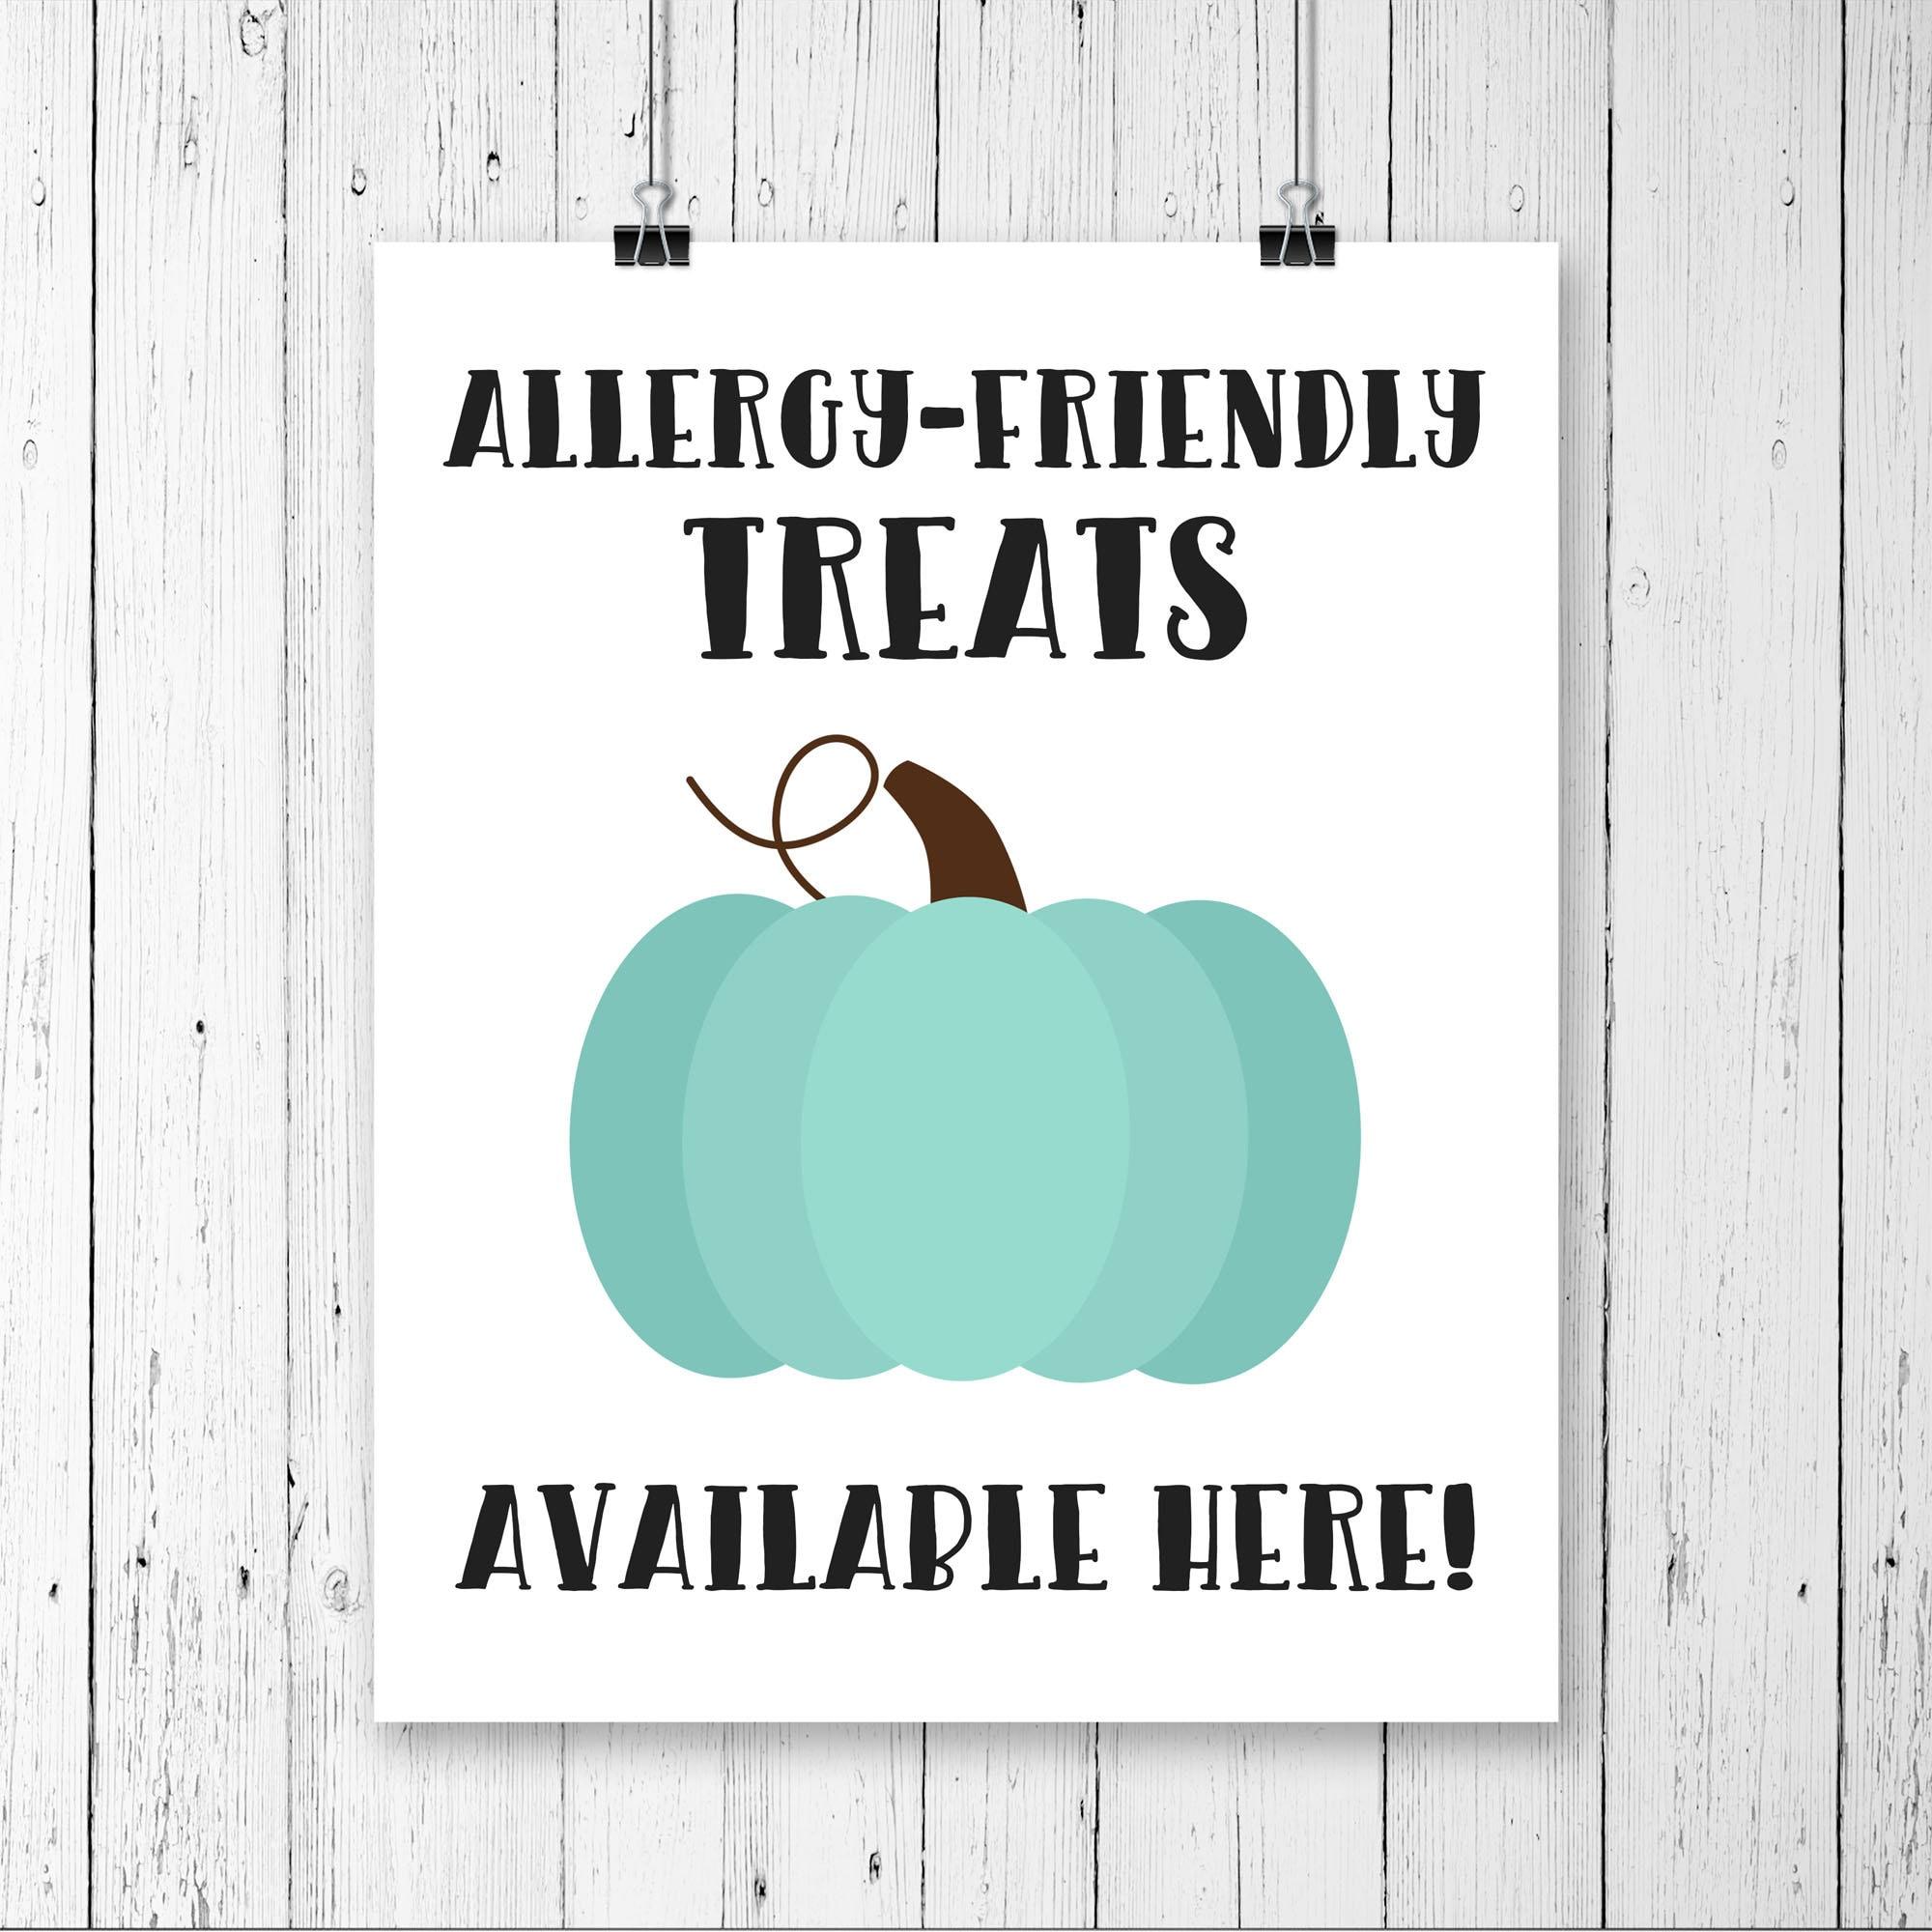 photo regarding Teal Pumpkin Printable named Printable Teal Pumpkin Indicator, Teal Pumpkin Undertaking, Allergy